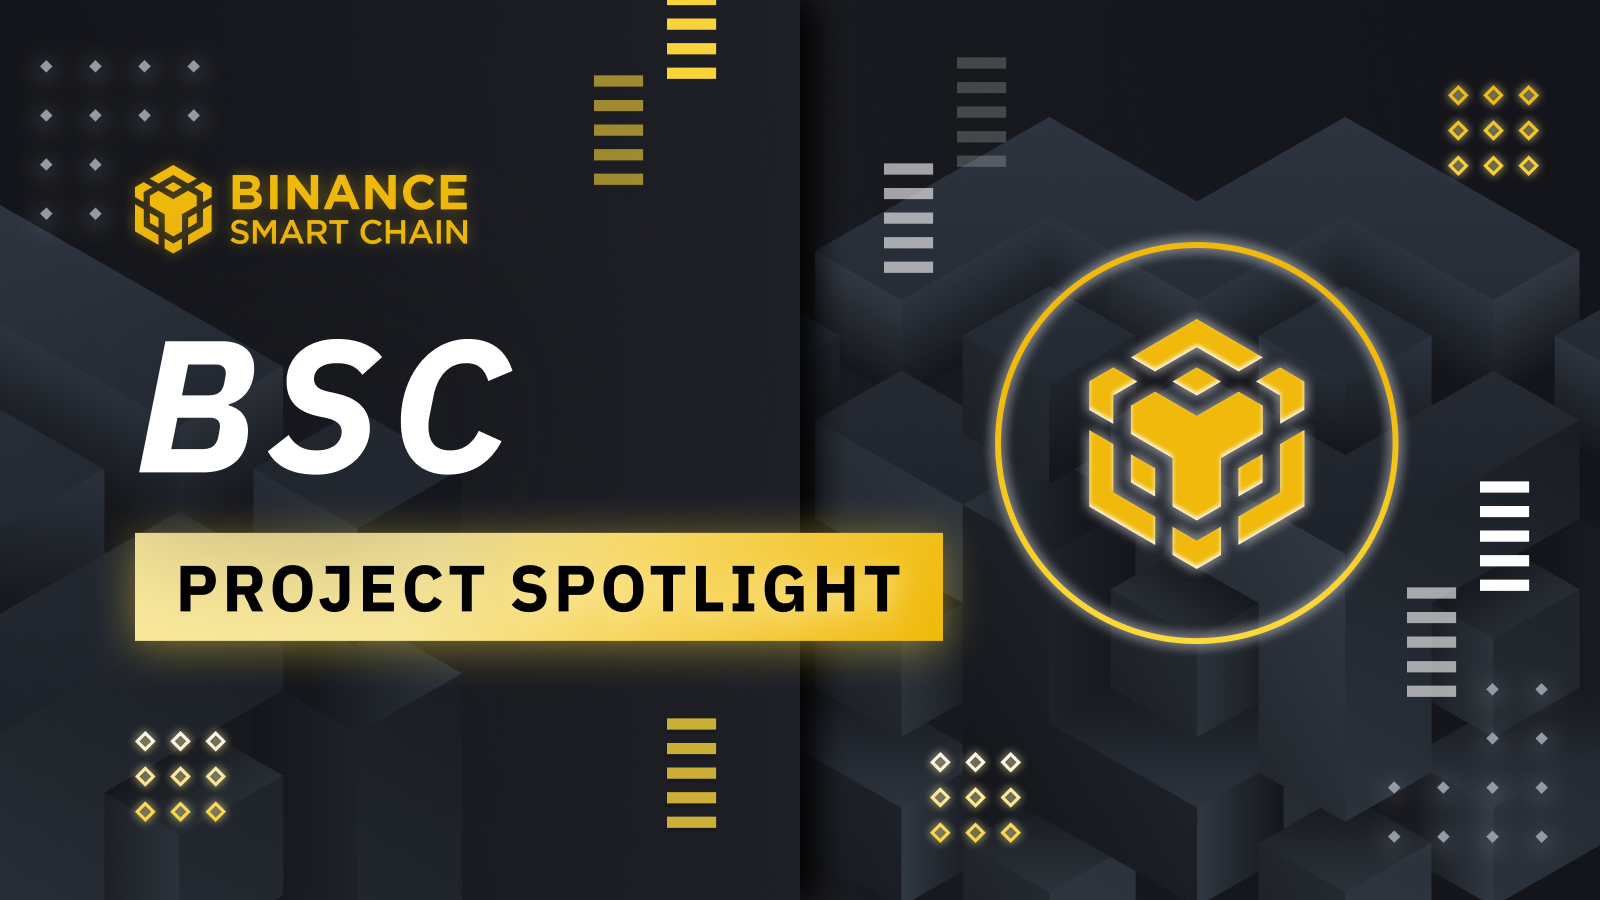 BSC Project Spotlight: Tenderly